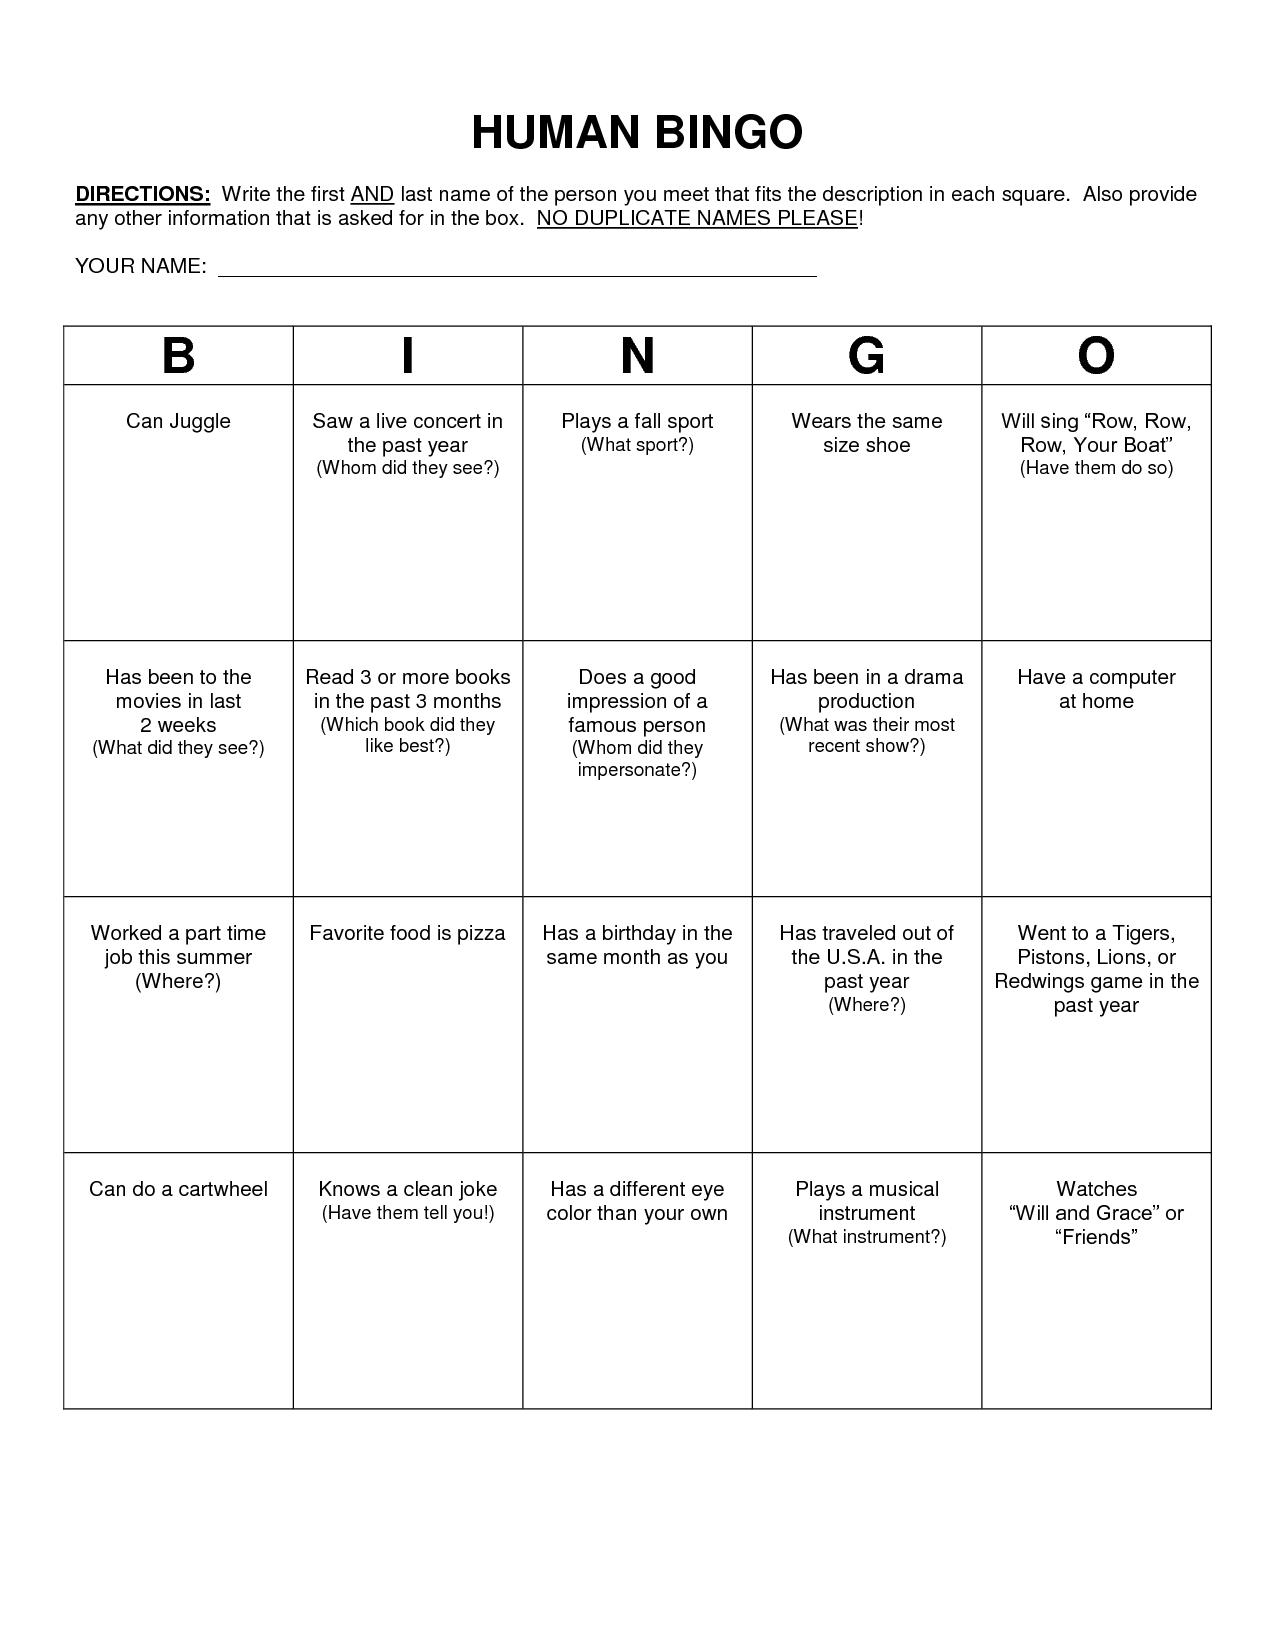 Human Bingo Scavenger Hunt Template Human Bingo Bingo Template Bingo Card Template